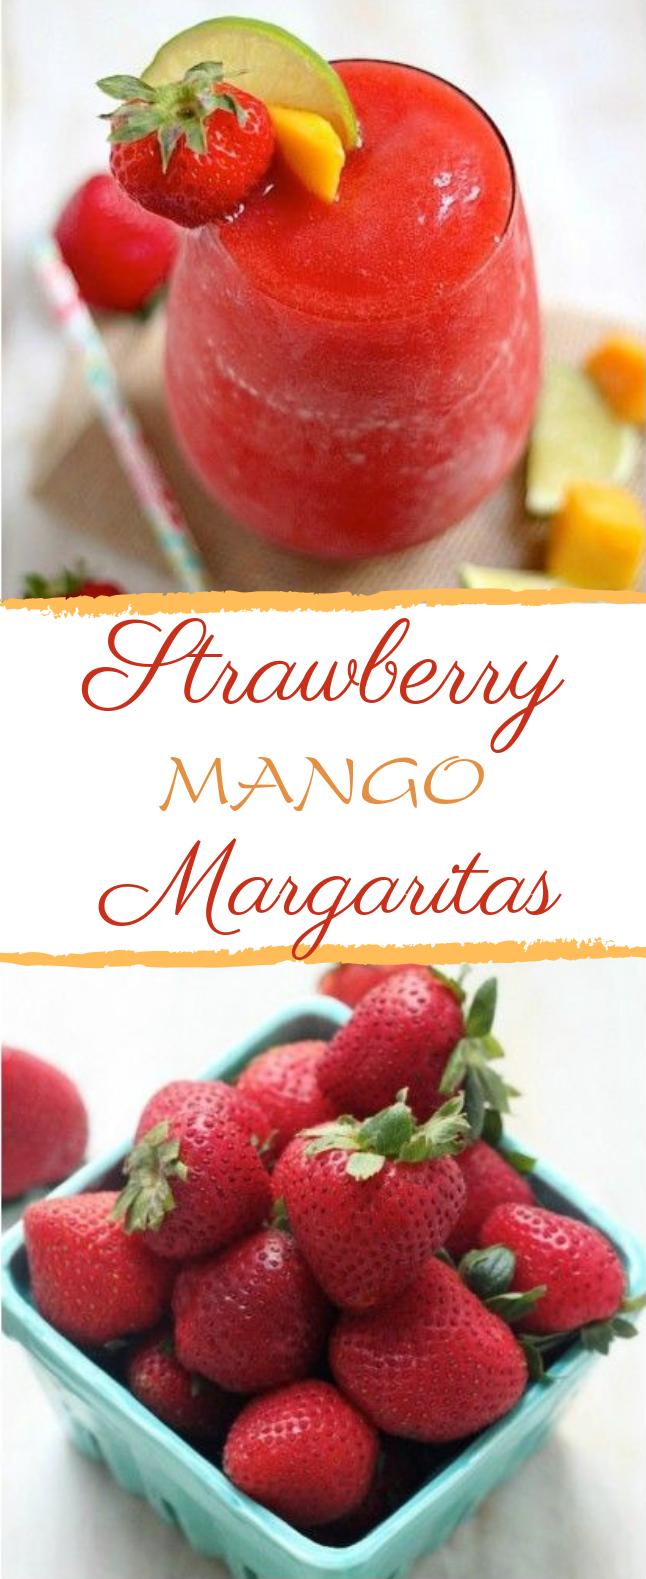 Strawberry Mango Margaritas #summerdrink #margarita